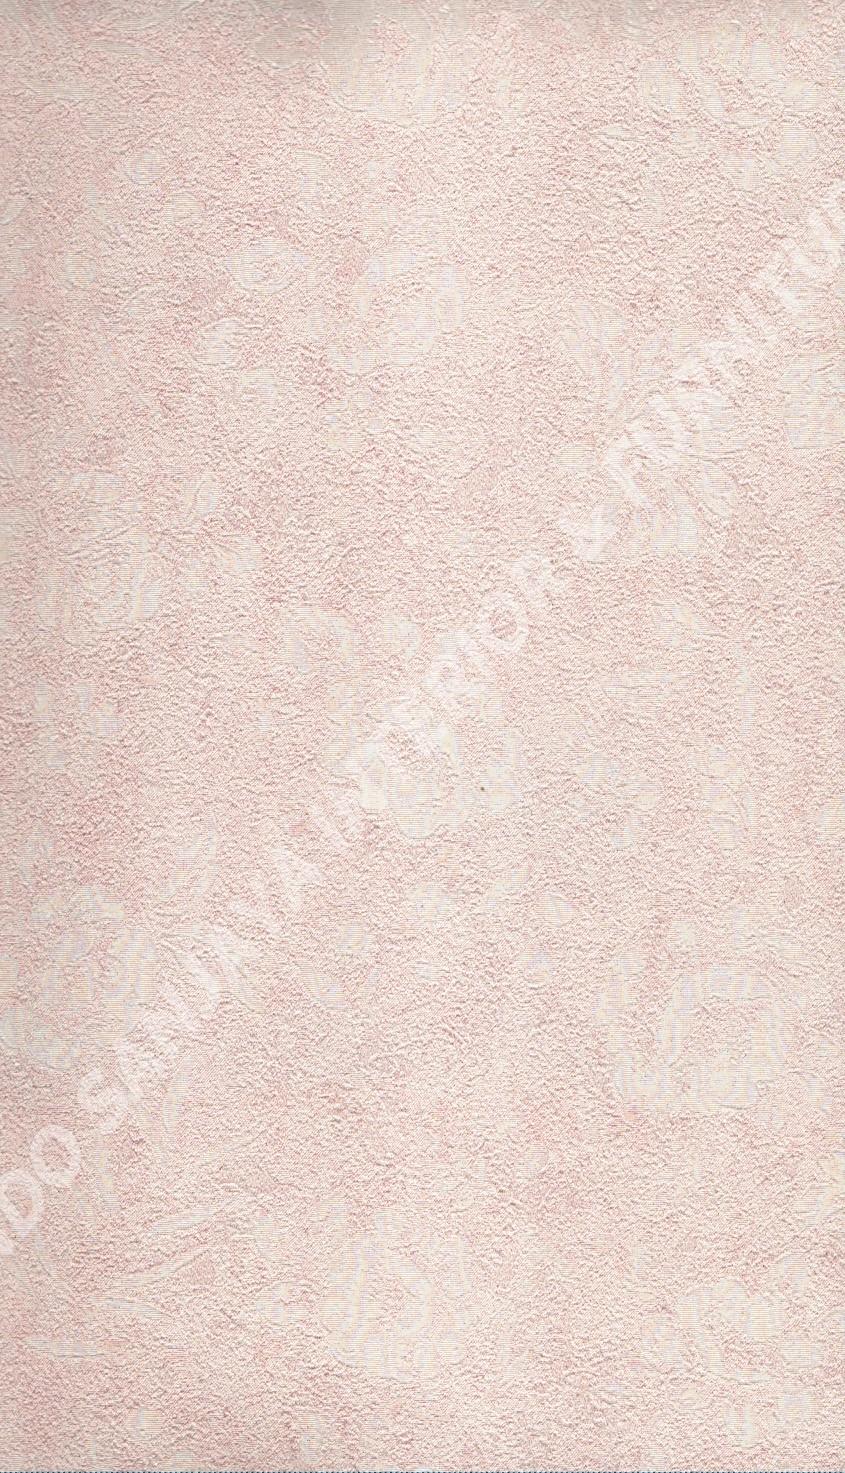 wallpaper   Wallpaper Minimalis Polos 51015-3:51015-3 corak  warna